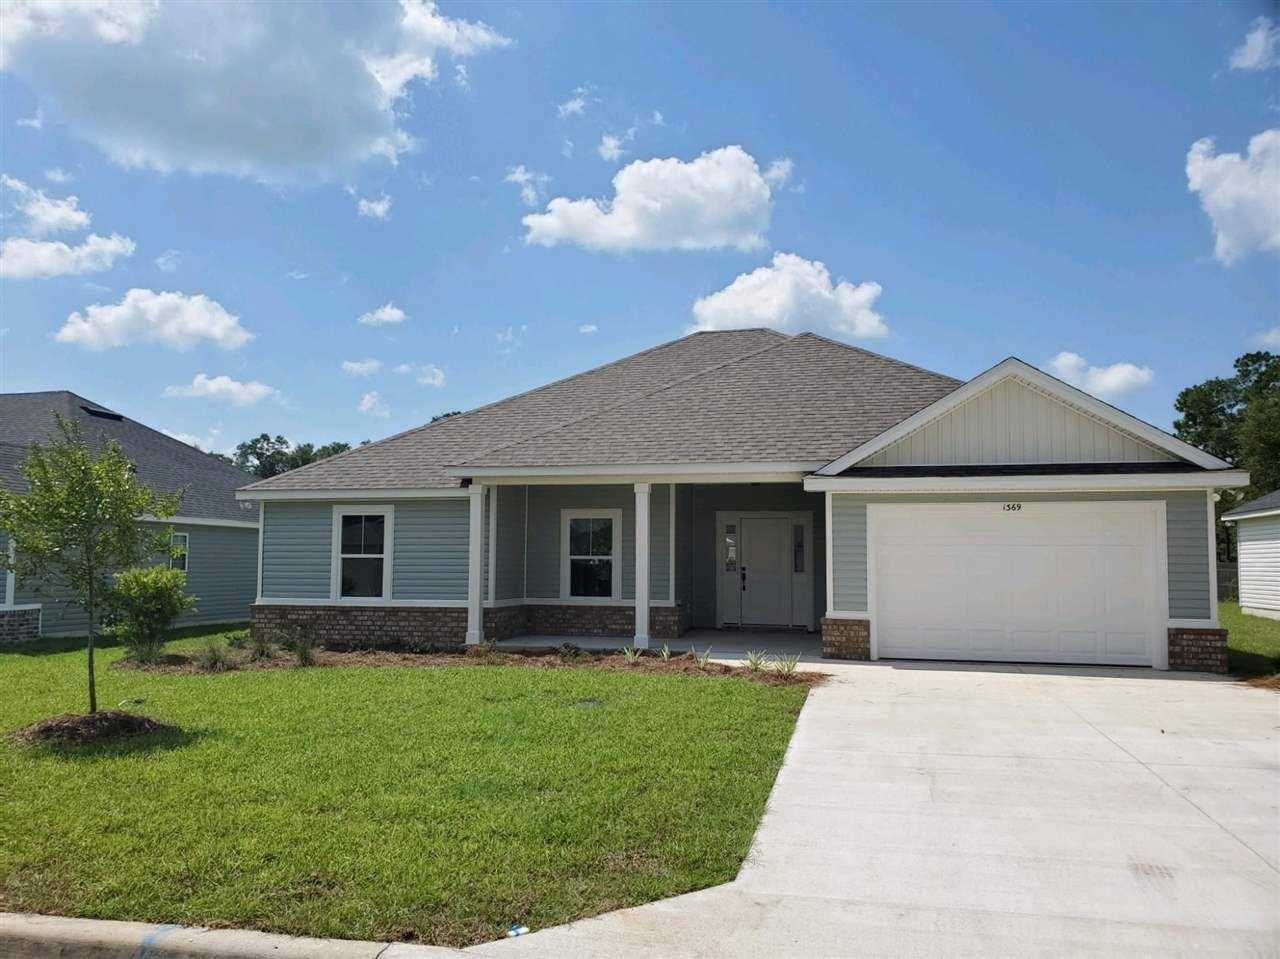 Photo of 4655 Center Drive, TALLAHASSEE, FL 32305 (MLS # 332277)